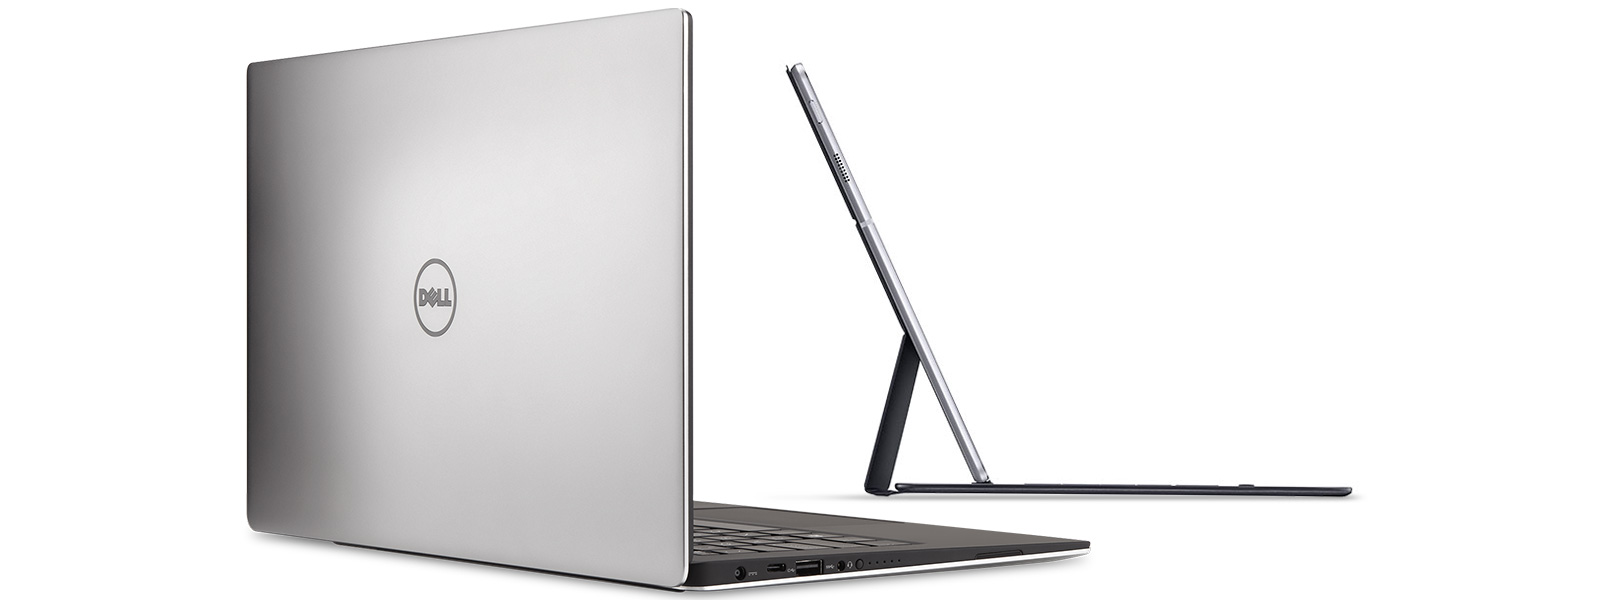 Windows 10 Dell 筆記型電腦